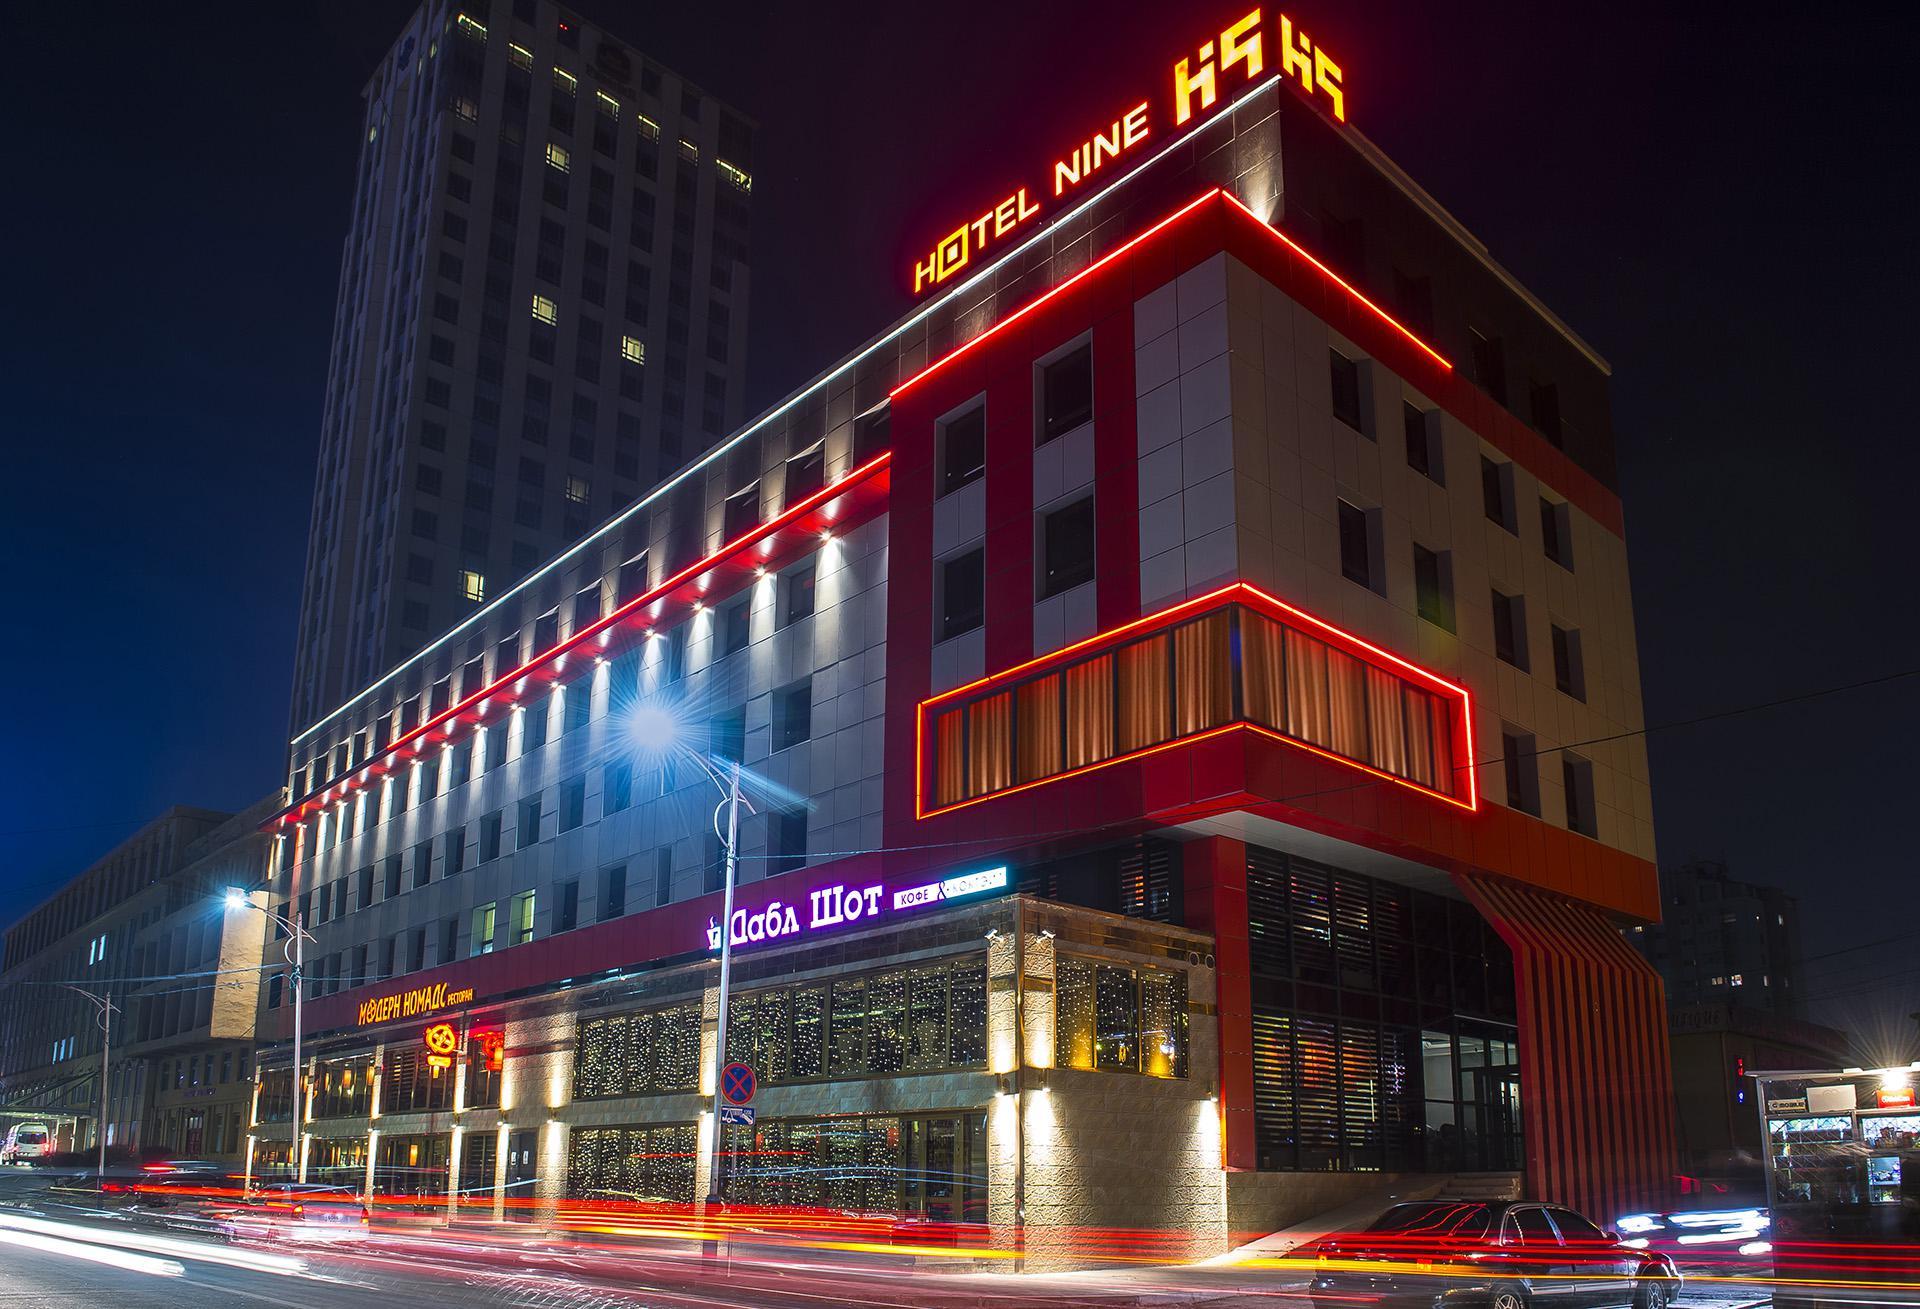 H9 Hotel Nine